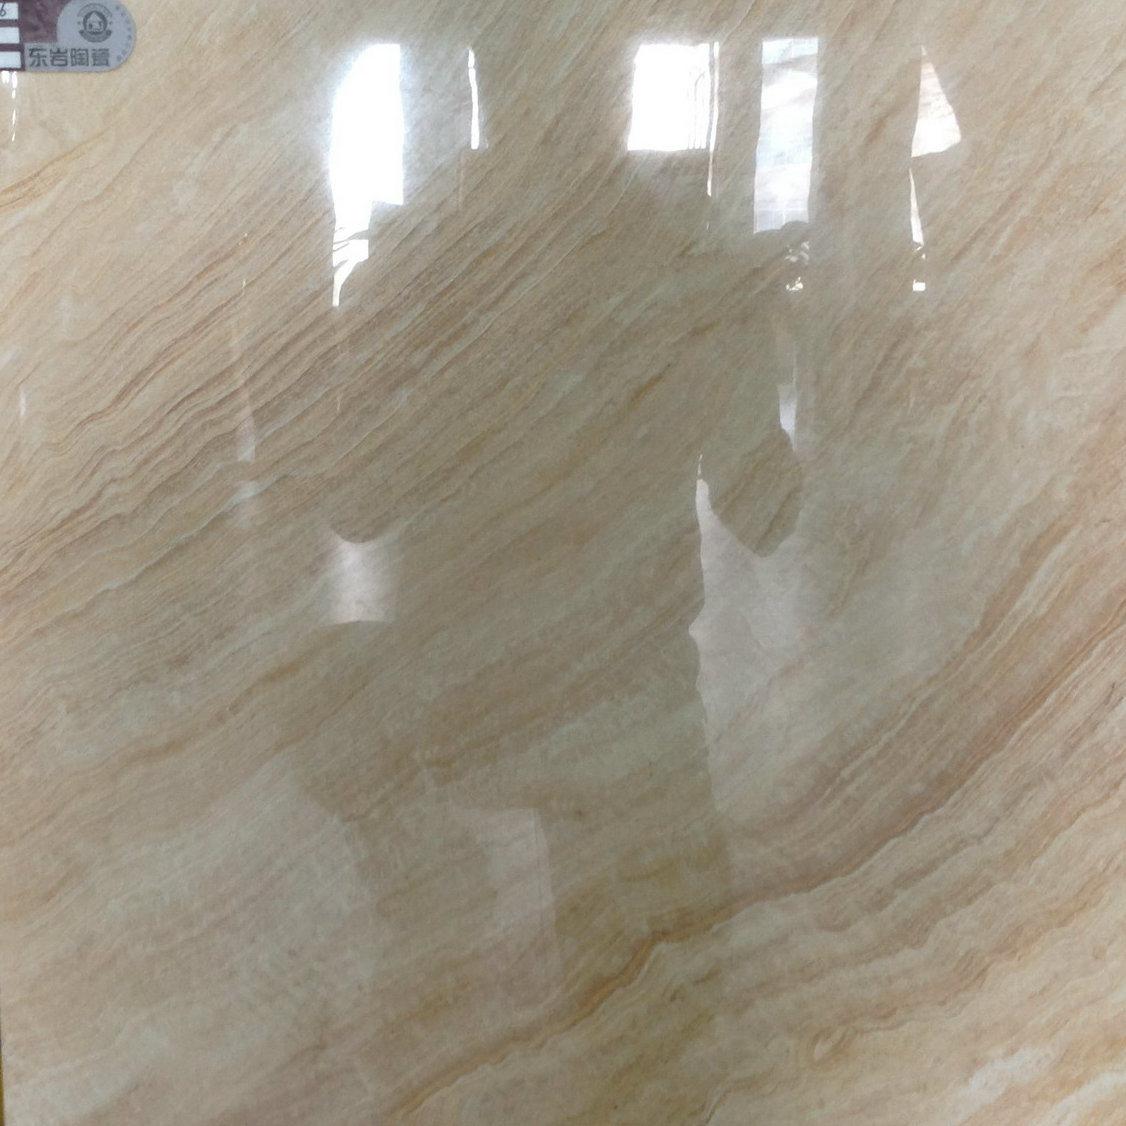 China Inkjet Printing Full Polished Glazed Porcelain Floor Tile